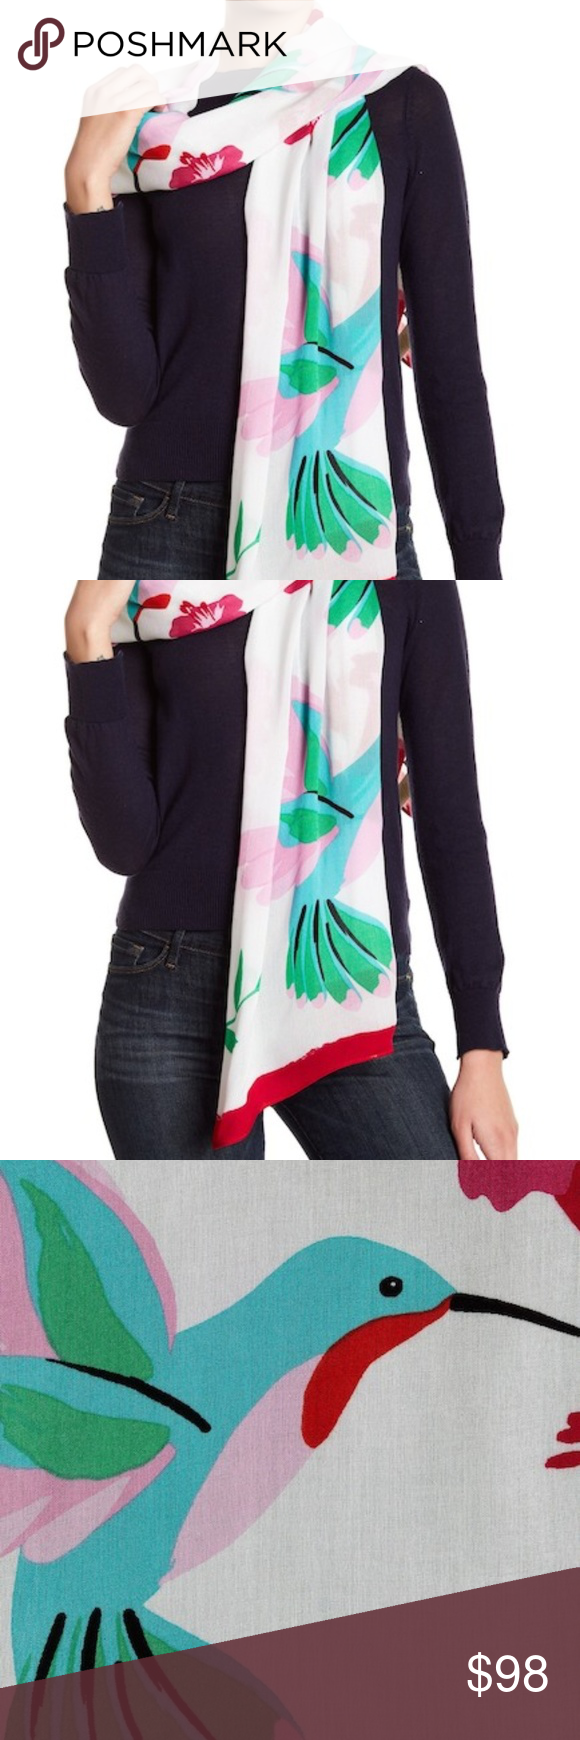 Kate spade new york hummingbird scarf nwt my posh picks